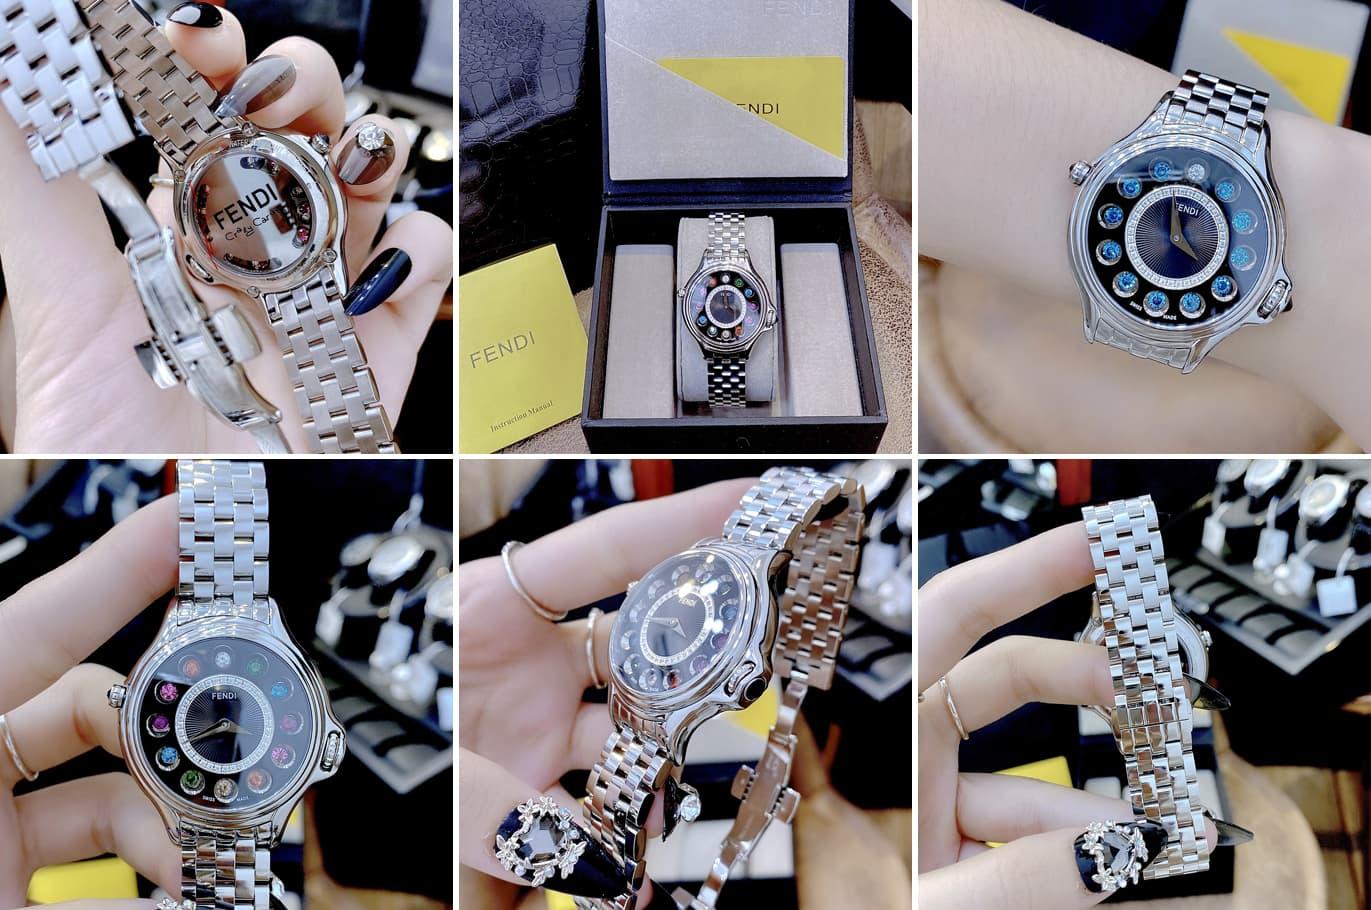 dong-ho-fendi-crazy-carats-diamond-38mm